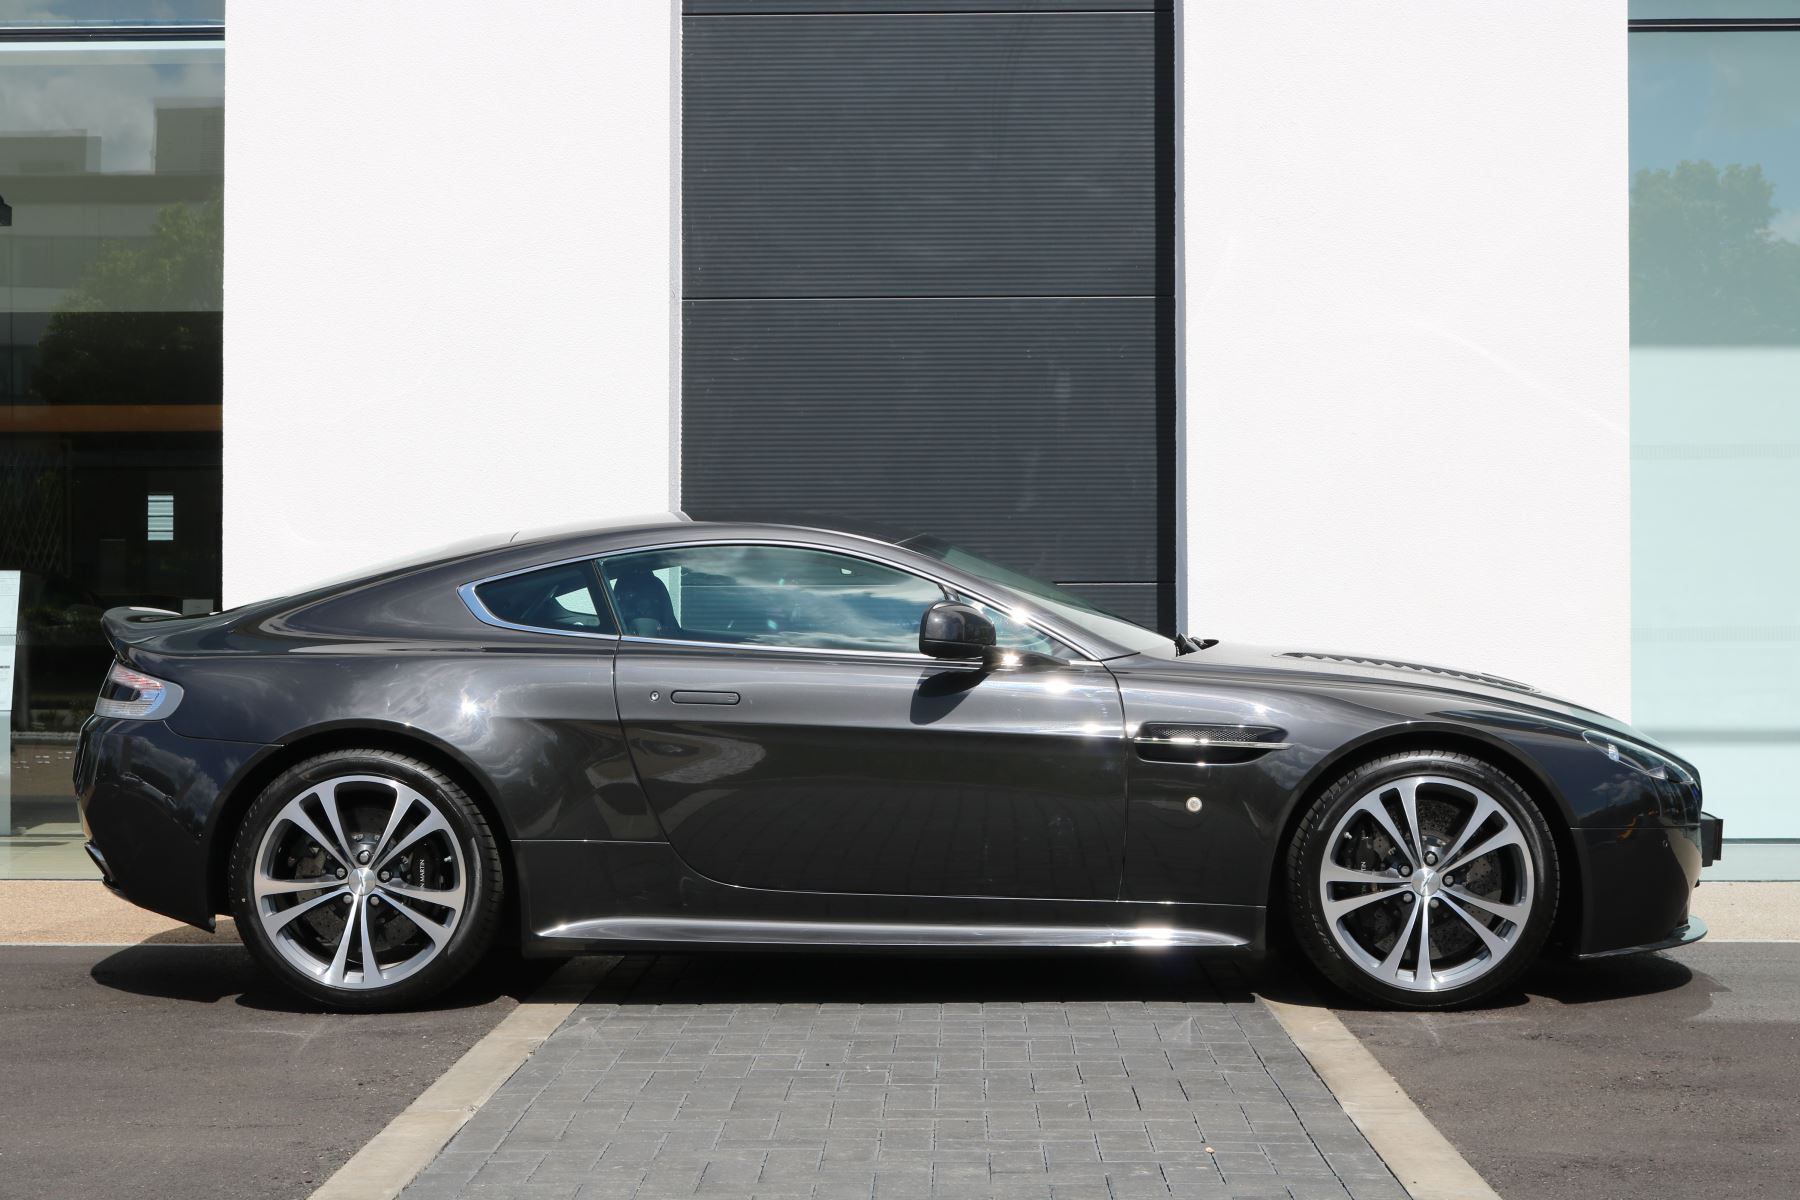 Aston Martin V12 Vantage 2dr image 7